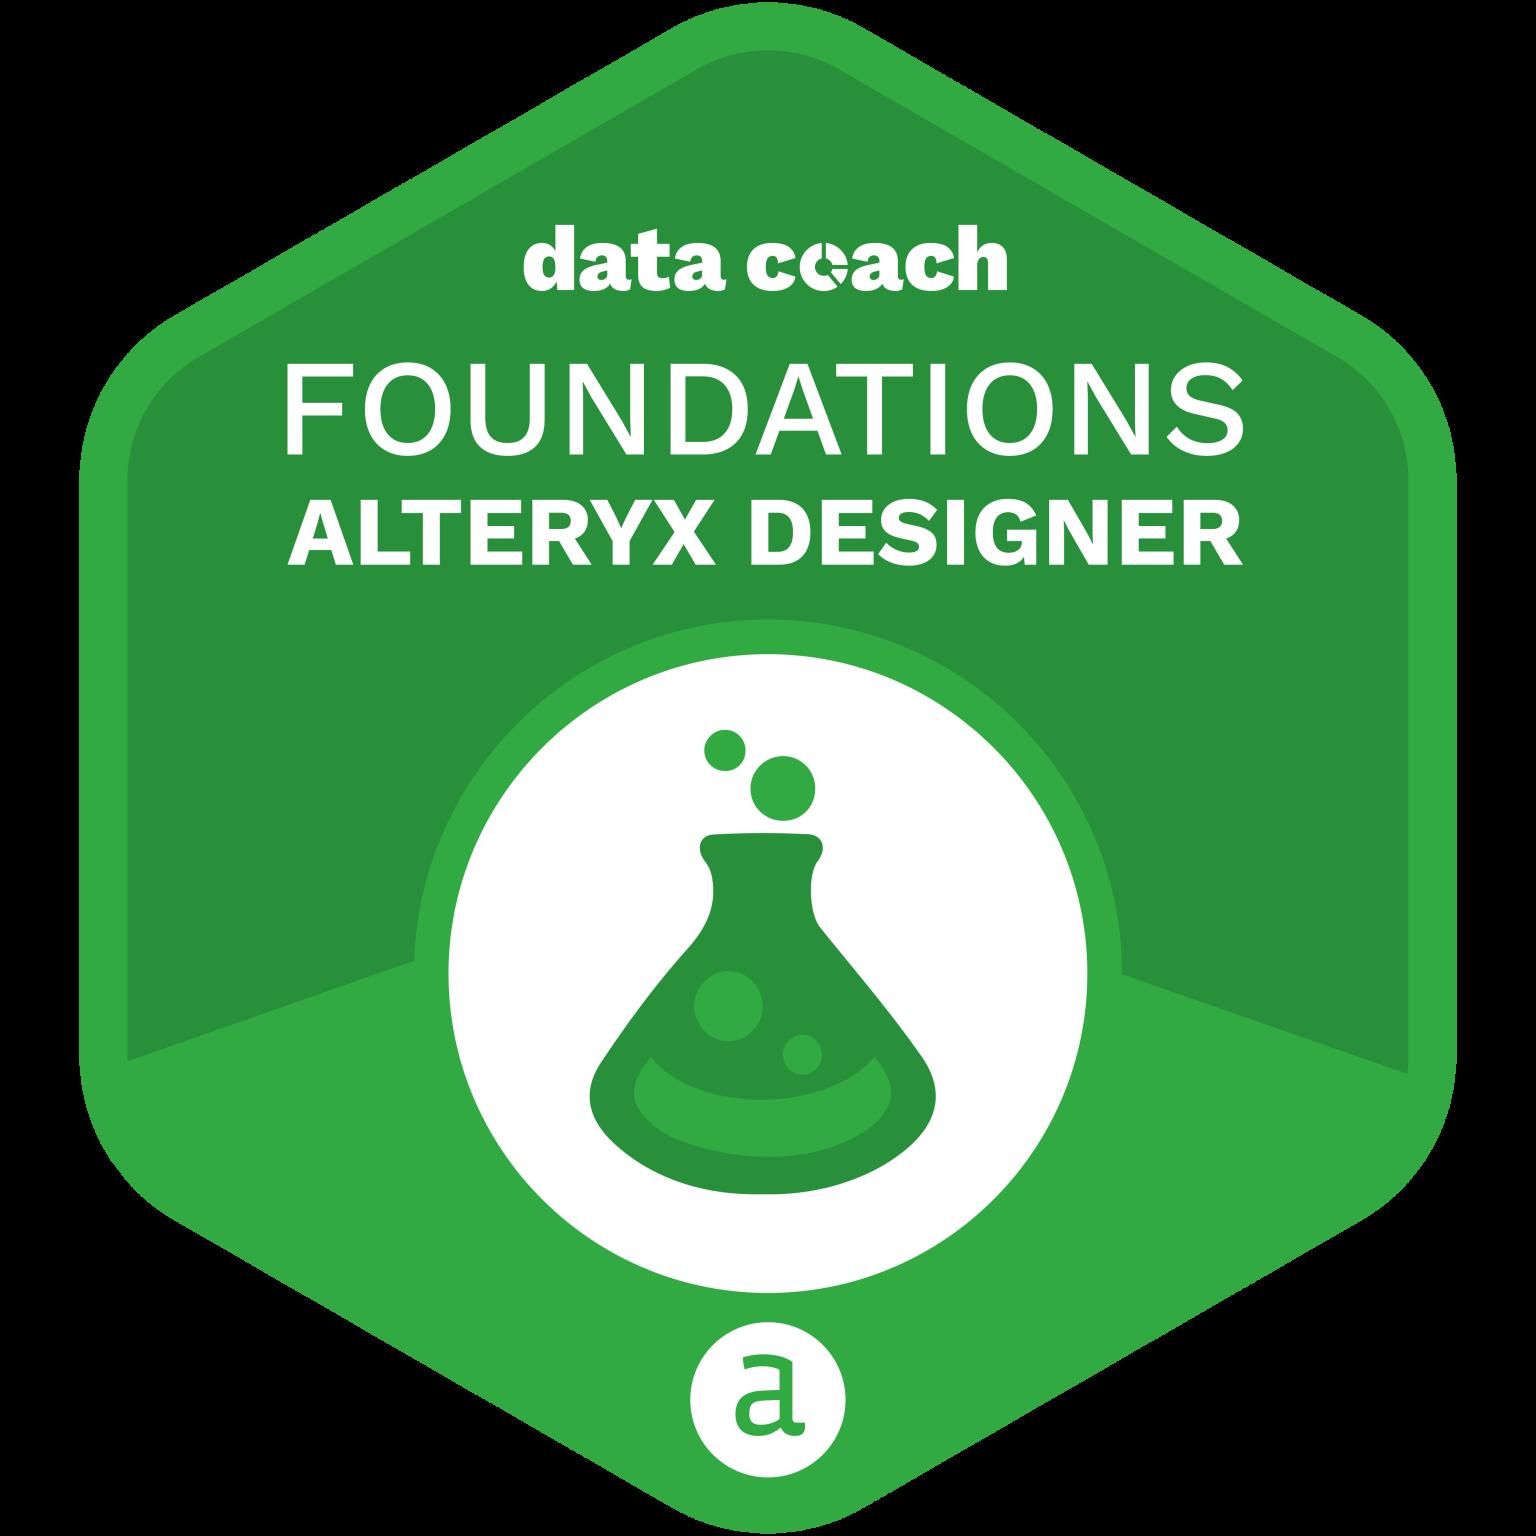 Alteryx-Designer-Foundations